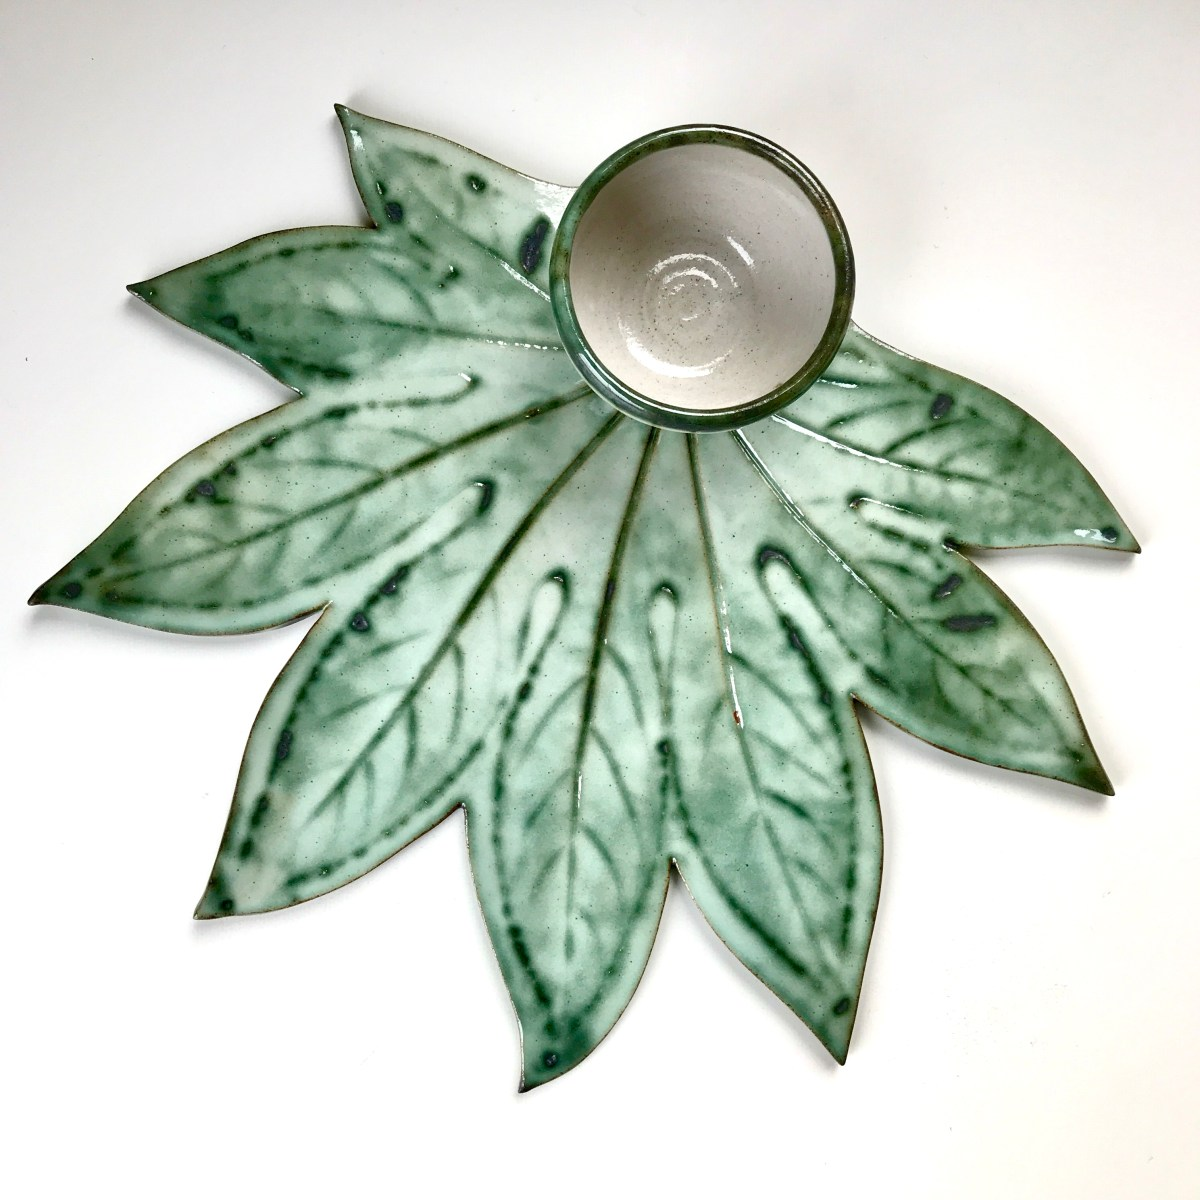 Fatsia Leaf Sharing Platter & Condiment Bowl by Sonya Ceramic Art